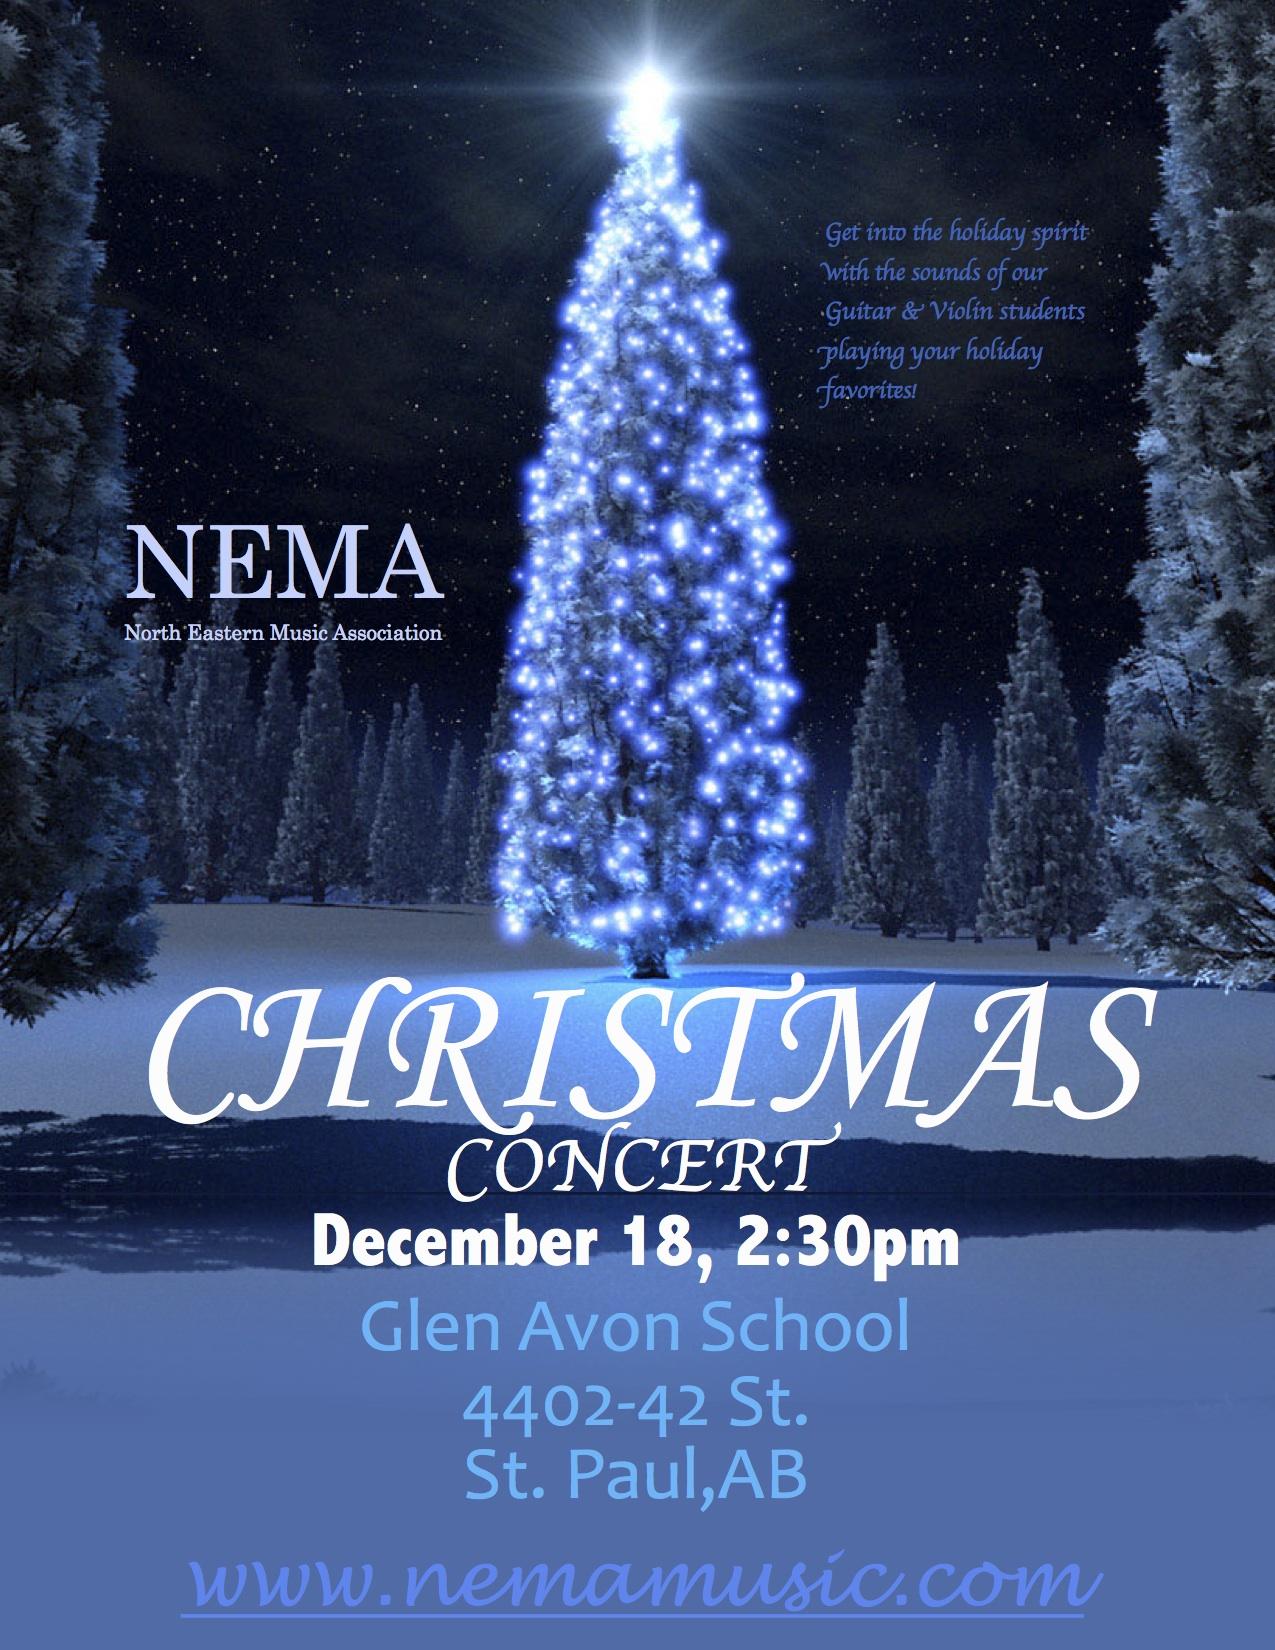 NEMA-Christmas-Concert-Poster-2011